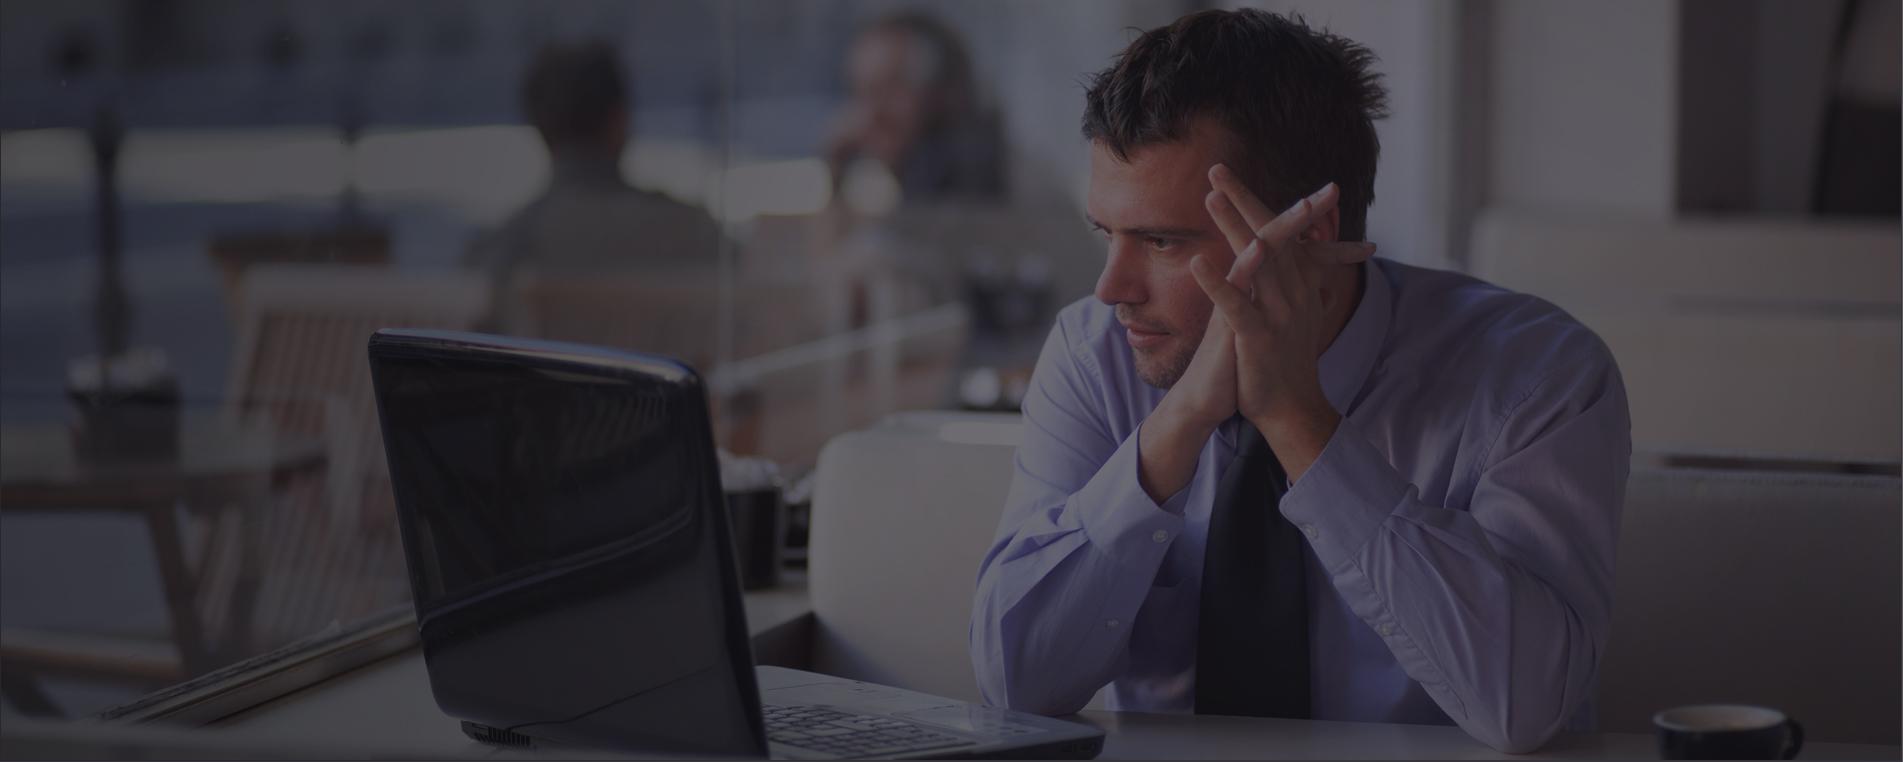 Insight – Financial Advisor, Business WordPress Theme